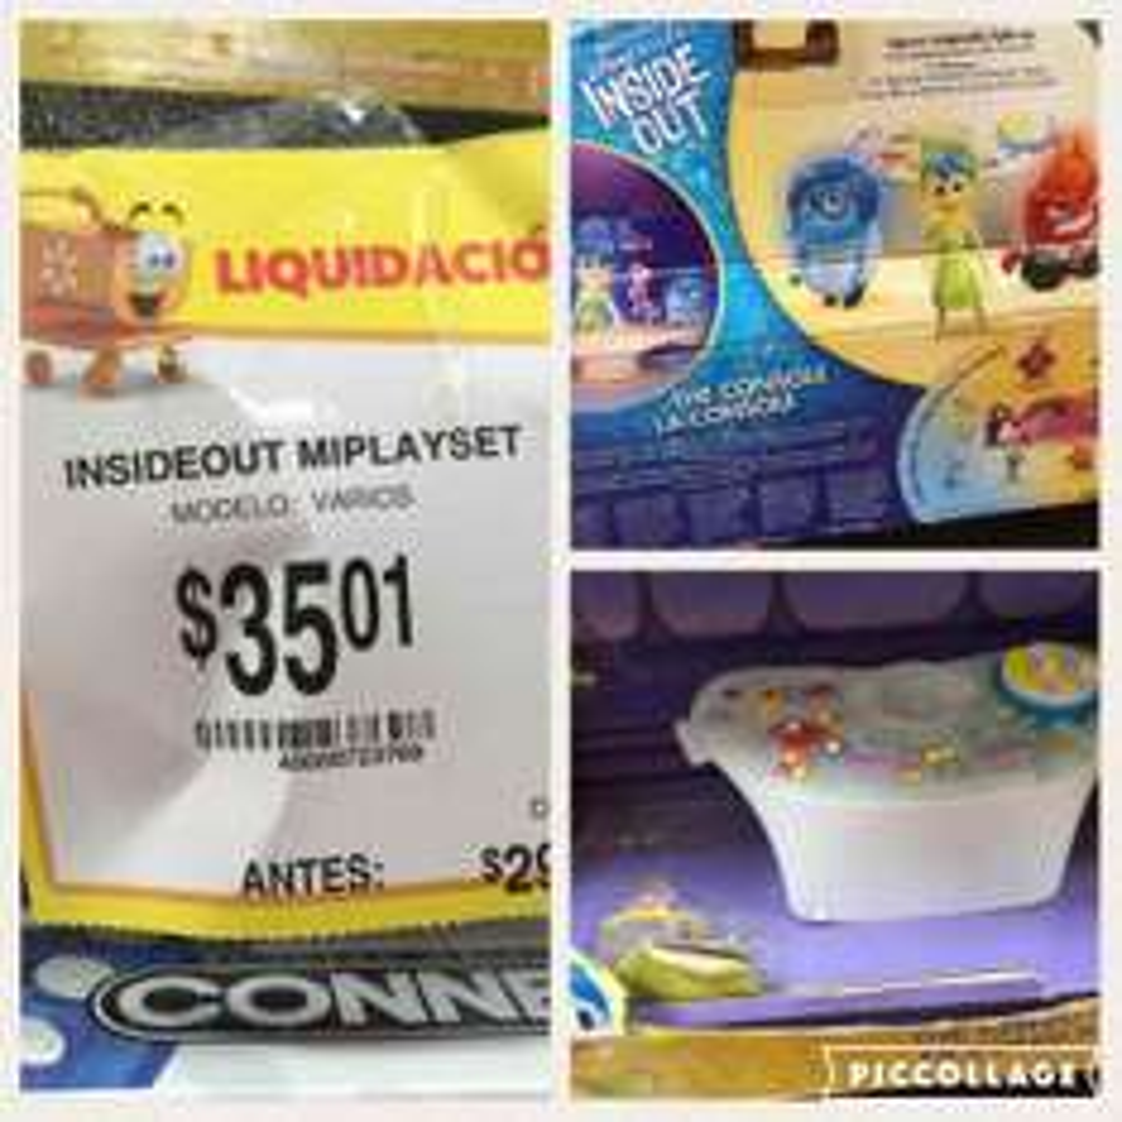 Walmart Chetumal: Consola Intensamente a $35.01